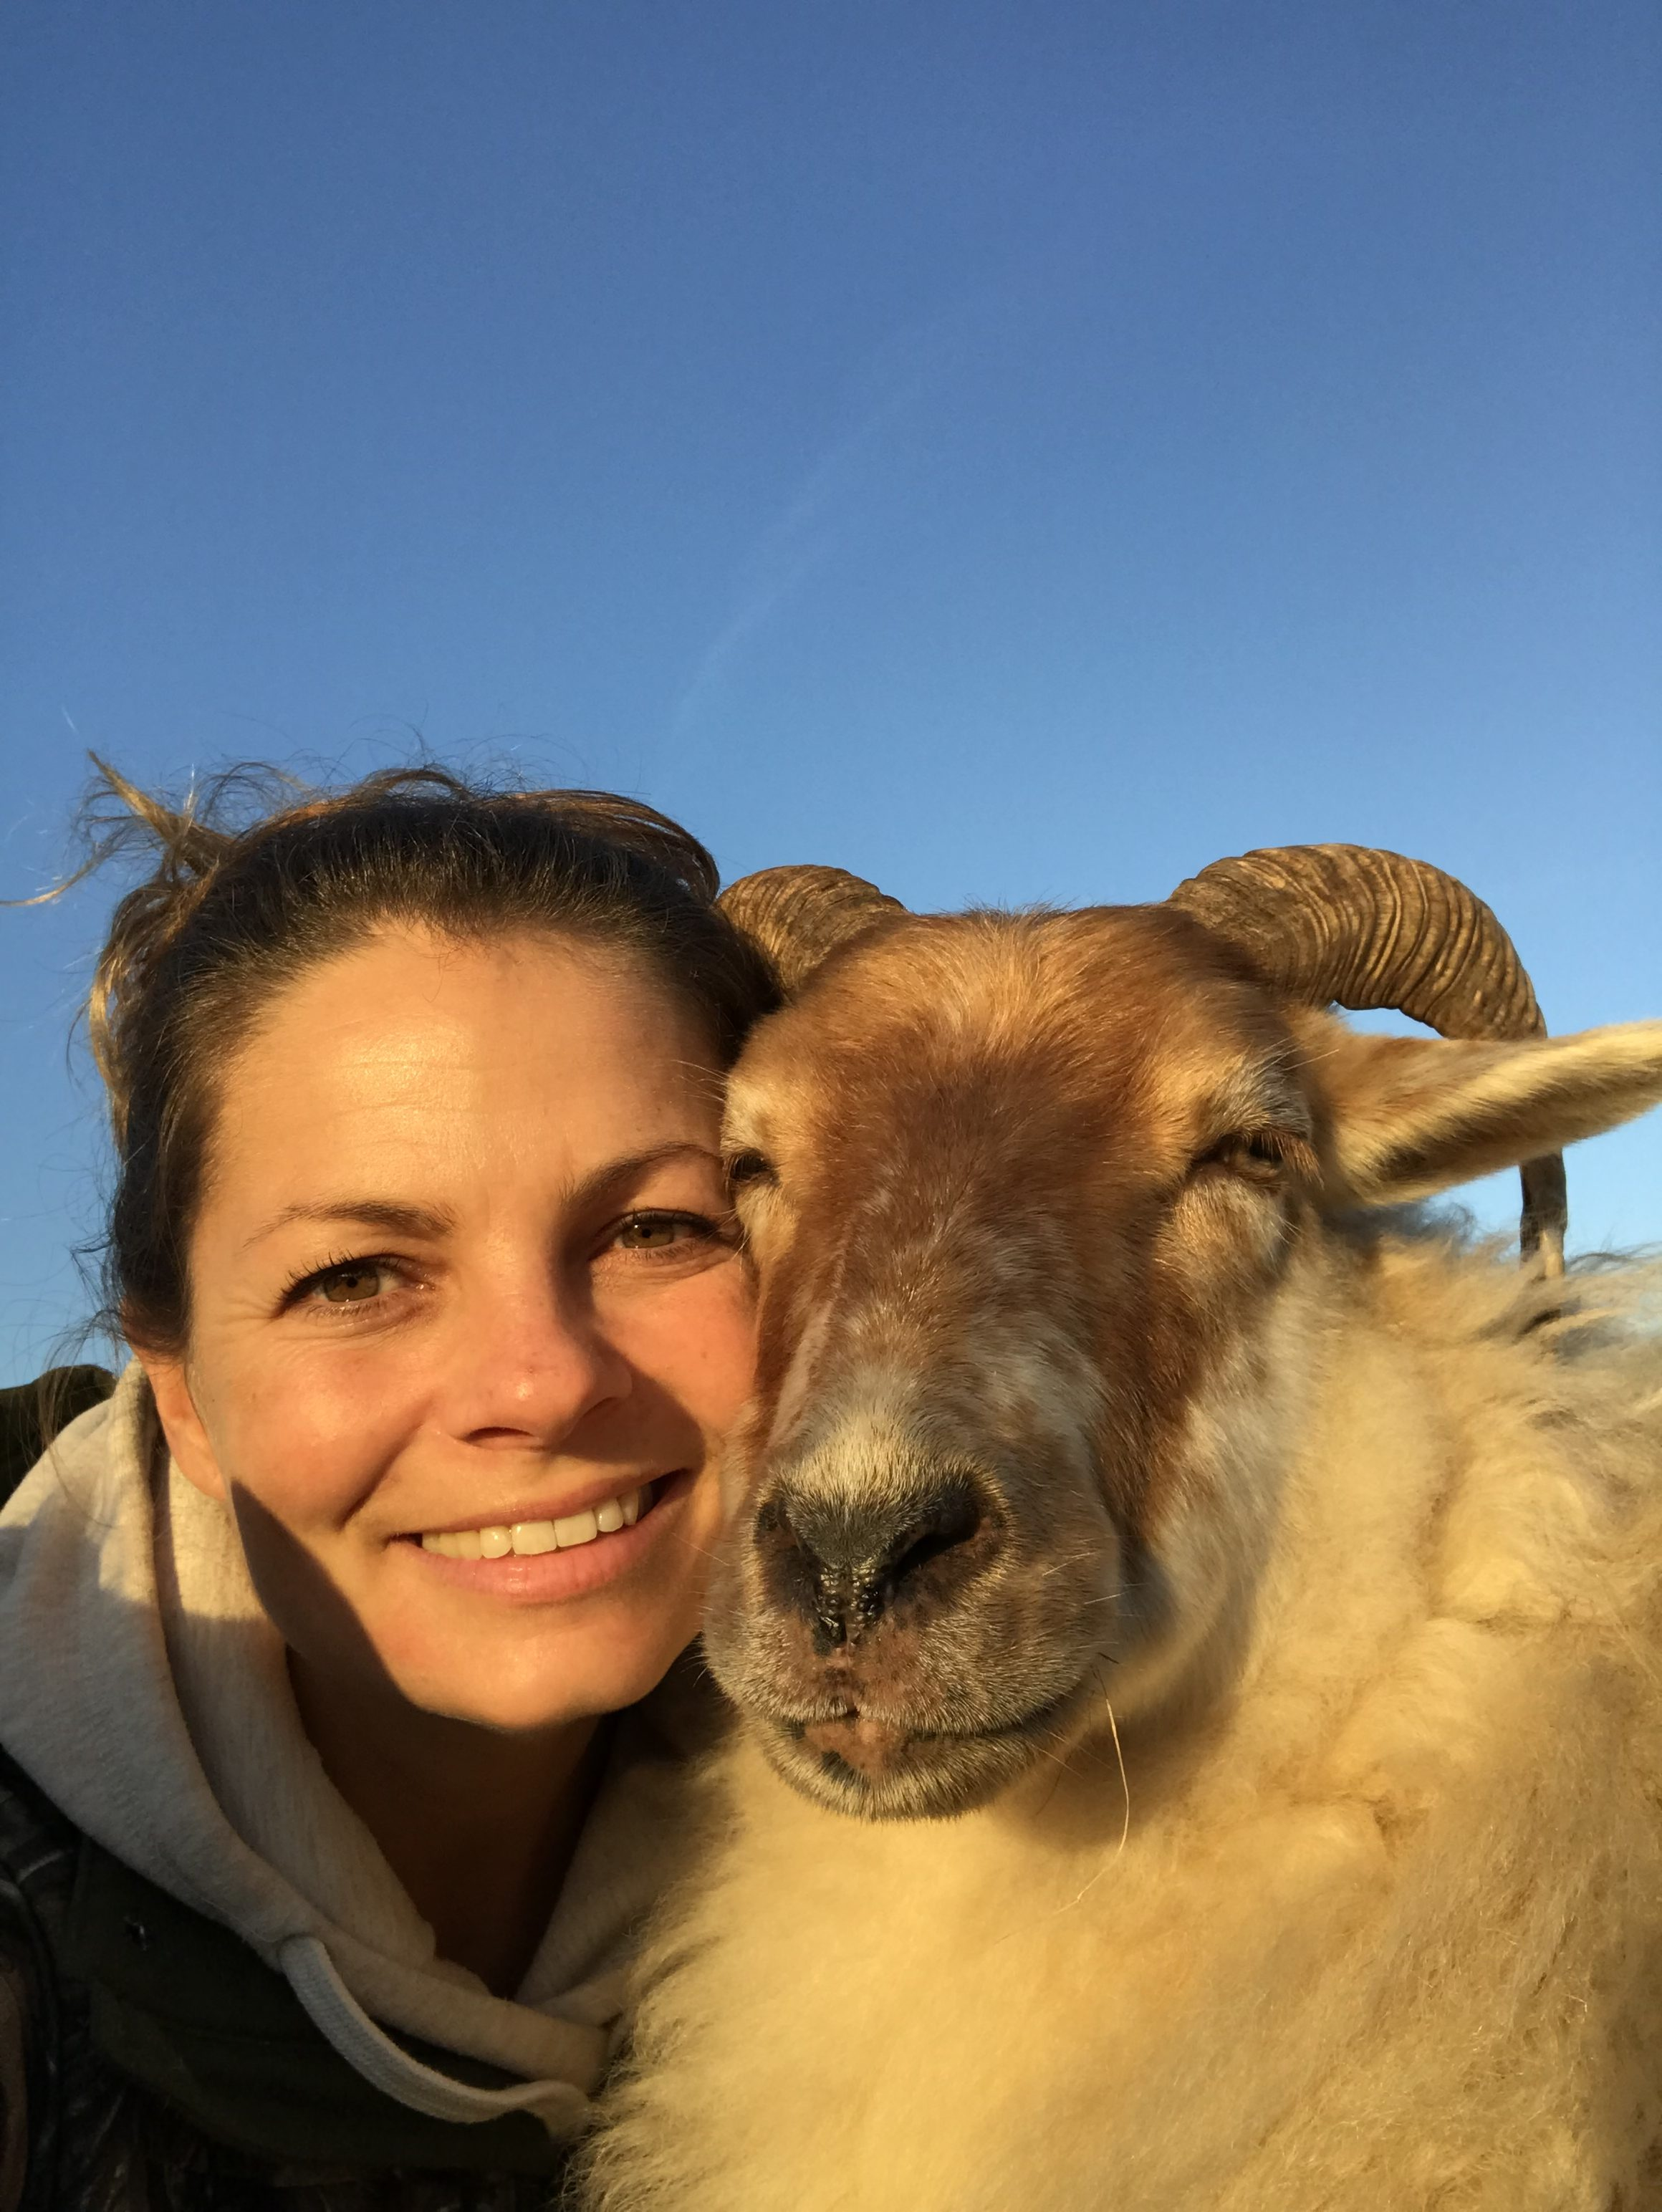 schapen herkennen gezichten